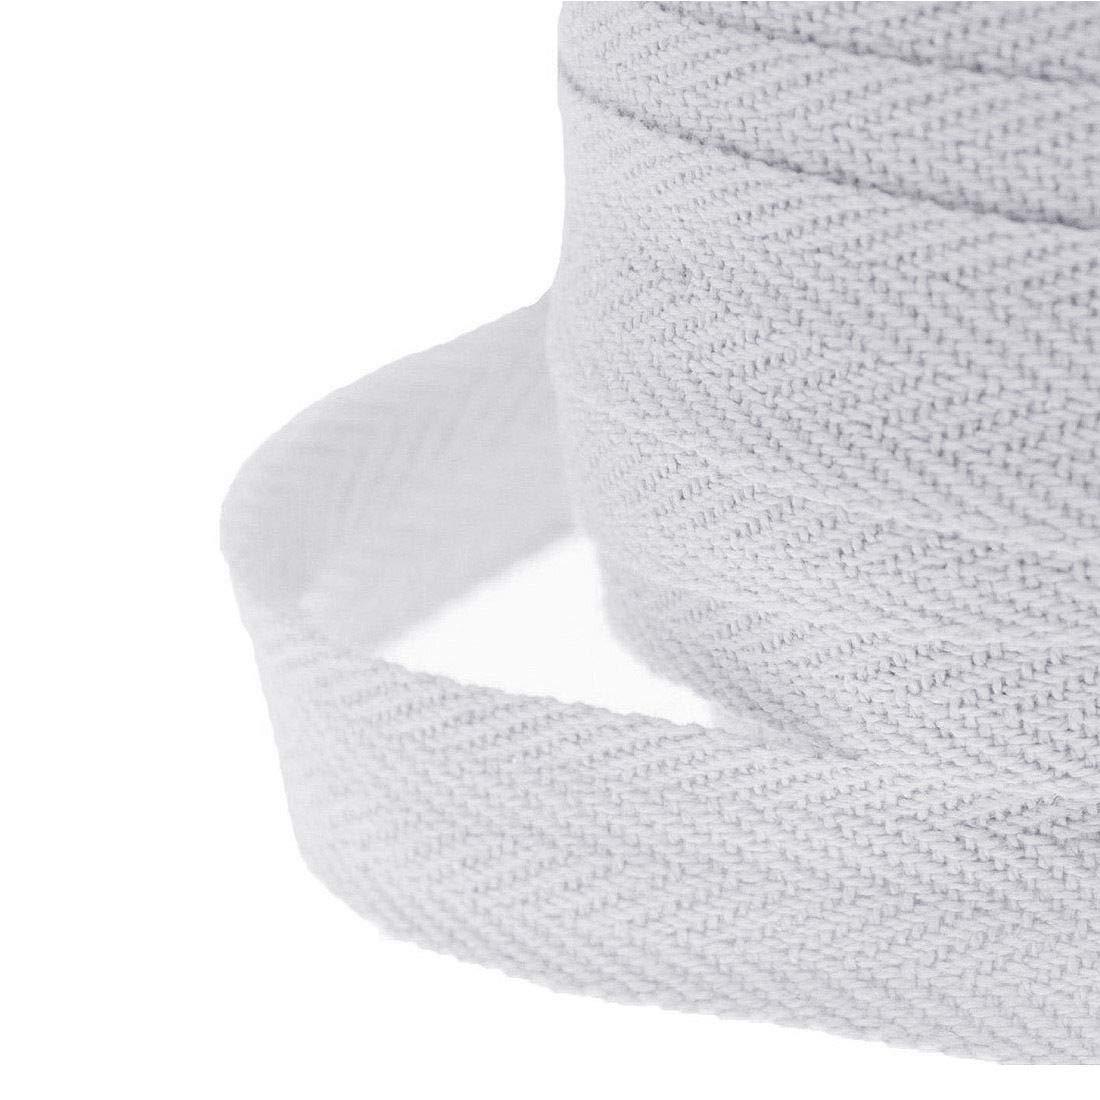 10/20/50M Roll Cotton Bunting Binding Apron Herringbone Twill Webbing Tape Sew -WAREHOUSESHOP (20 Meter (25mm), White)